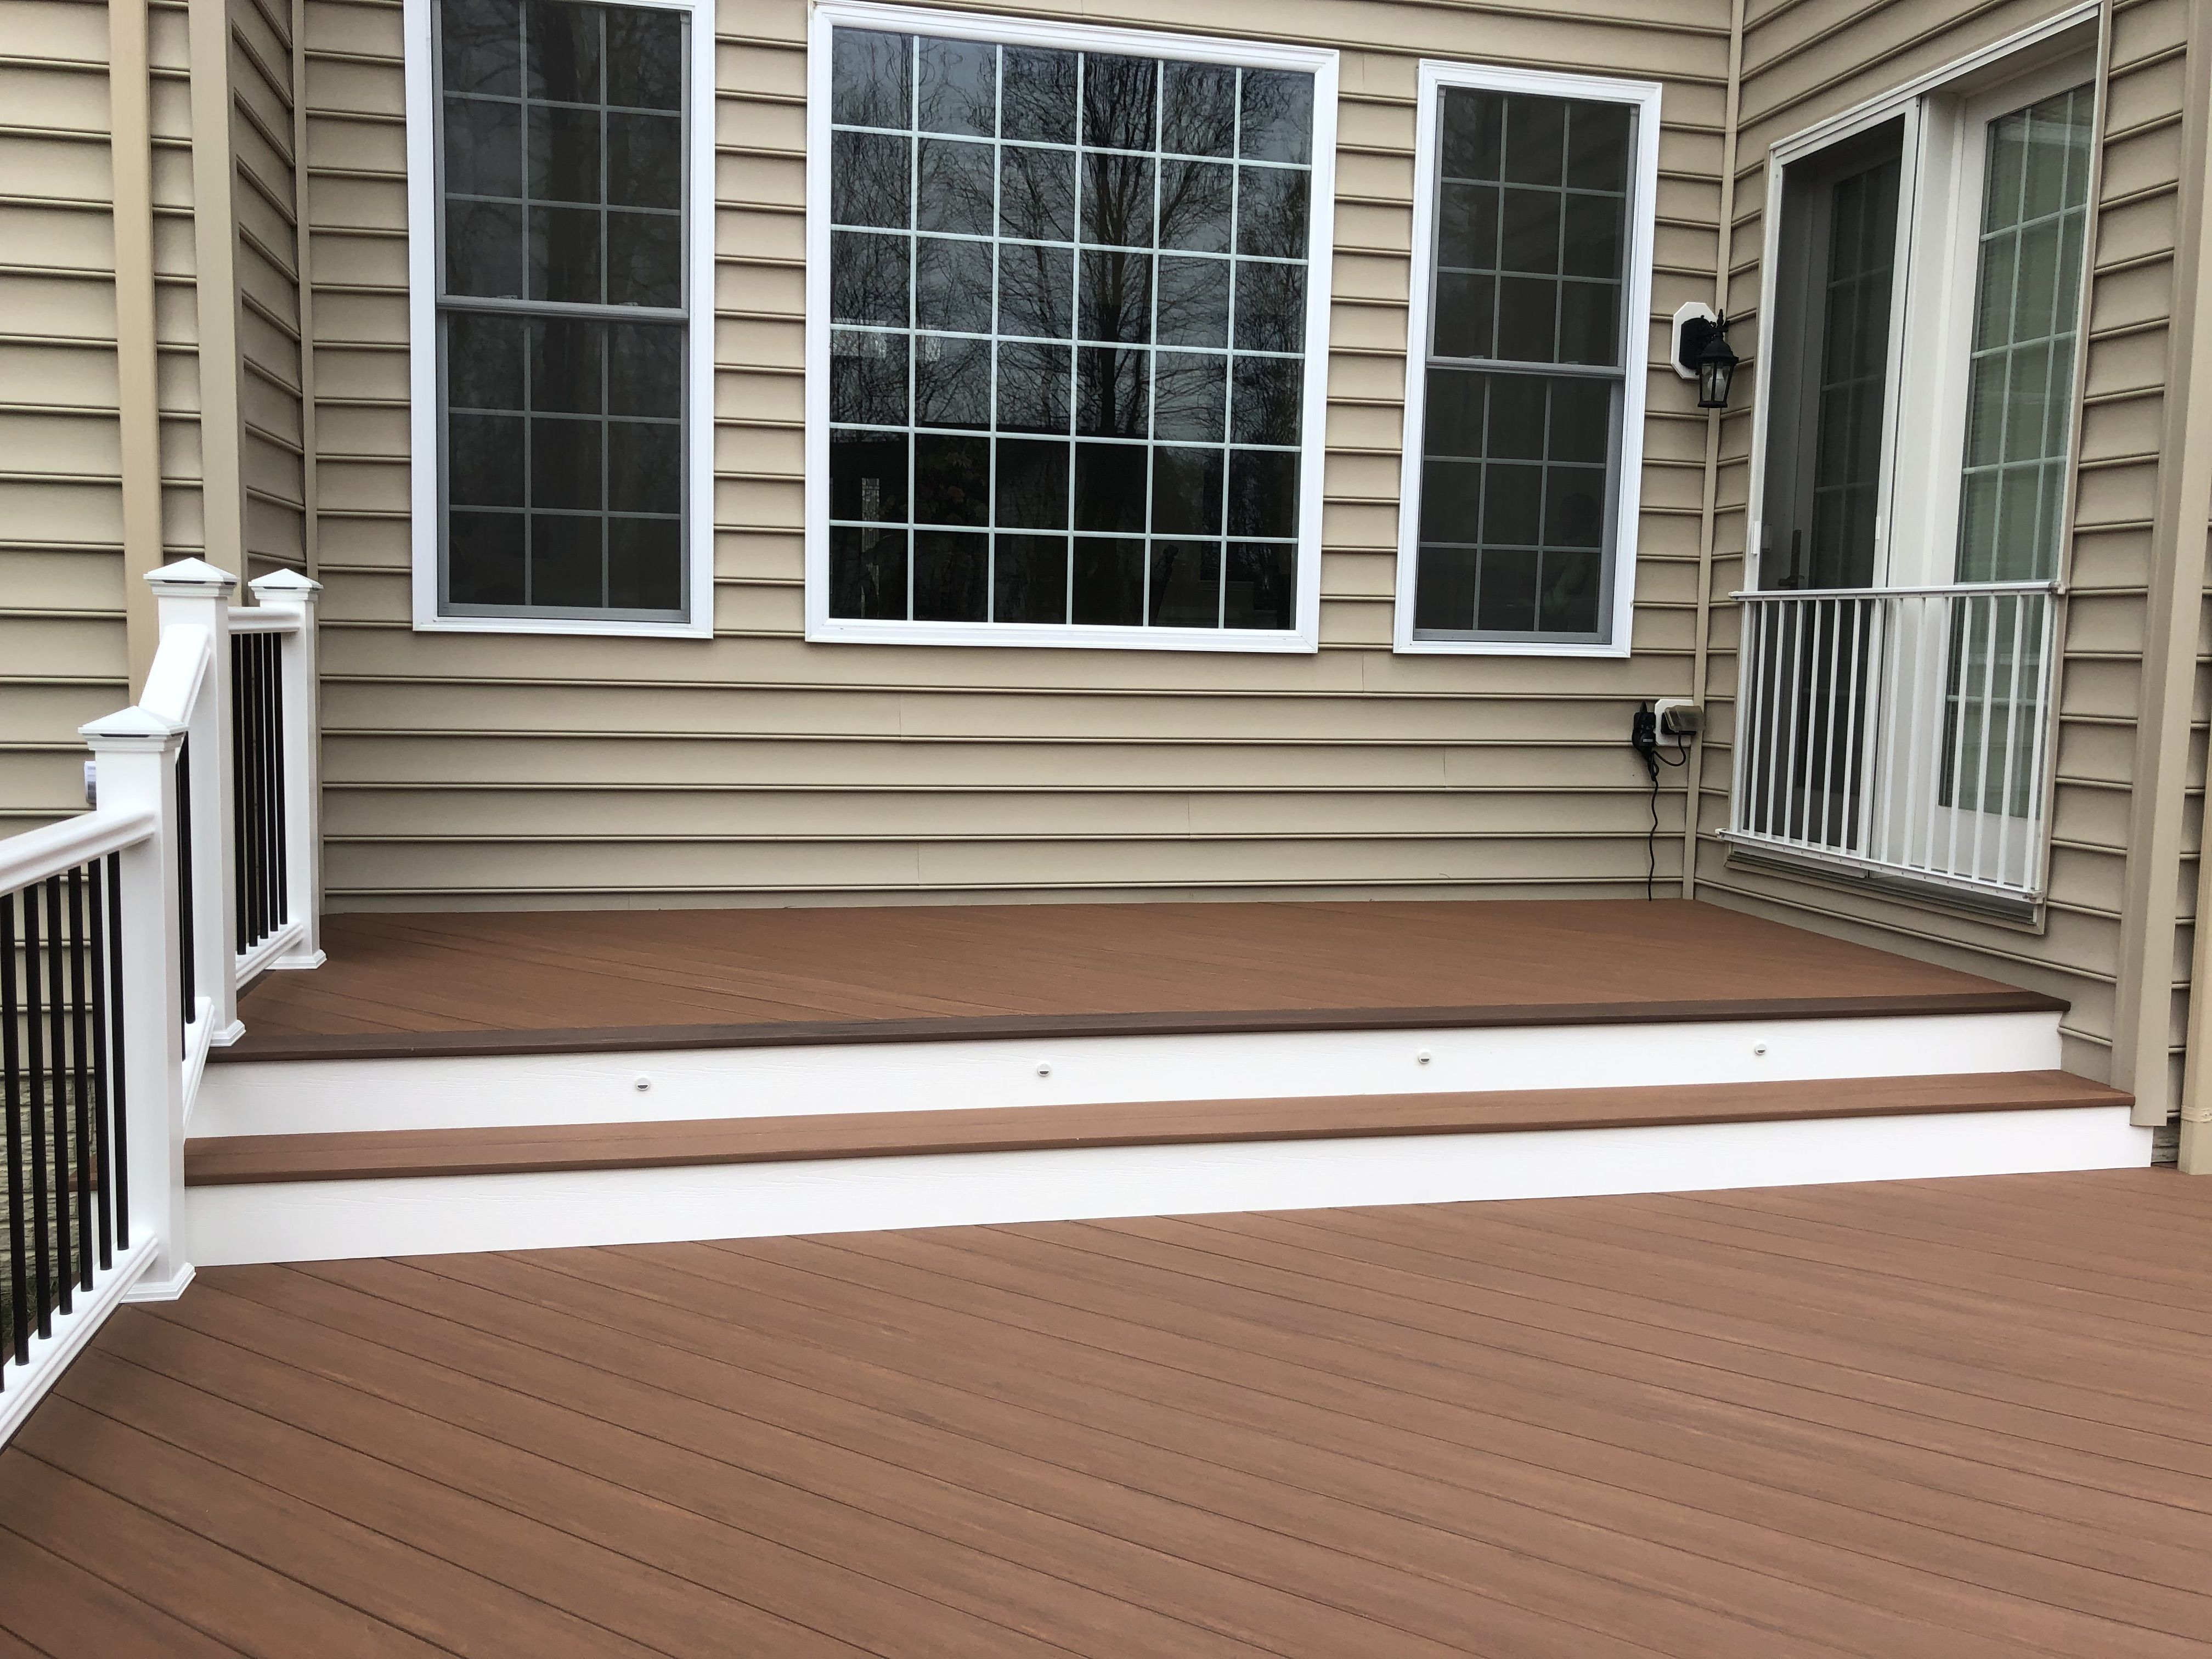 Timbertech Azek Deck Boards Installed In A Diagonal Pattern Azek Decking Deck Deck Boards